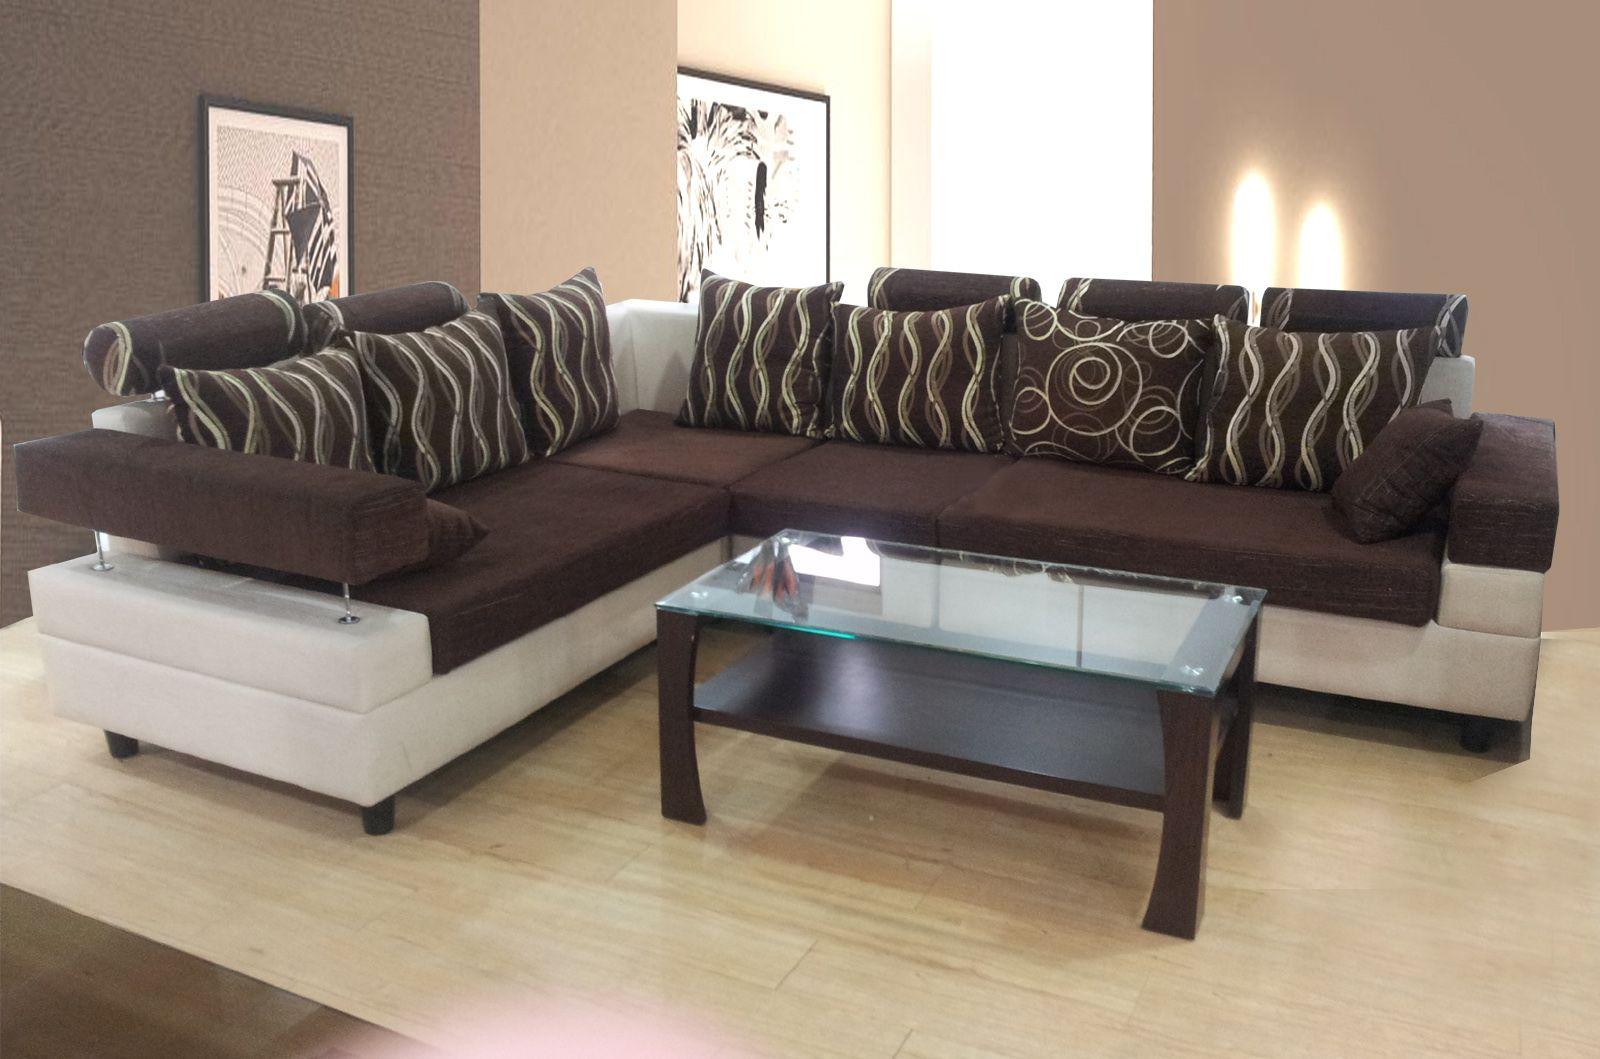 Sofa Set Materials In Kenya Www Gradschoolfairs Com